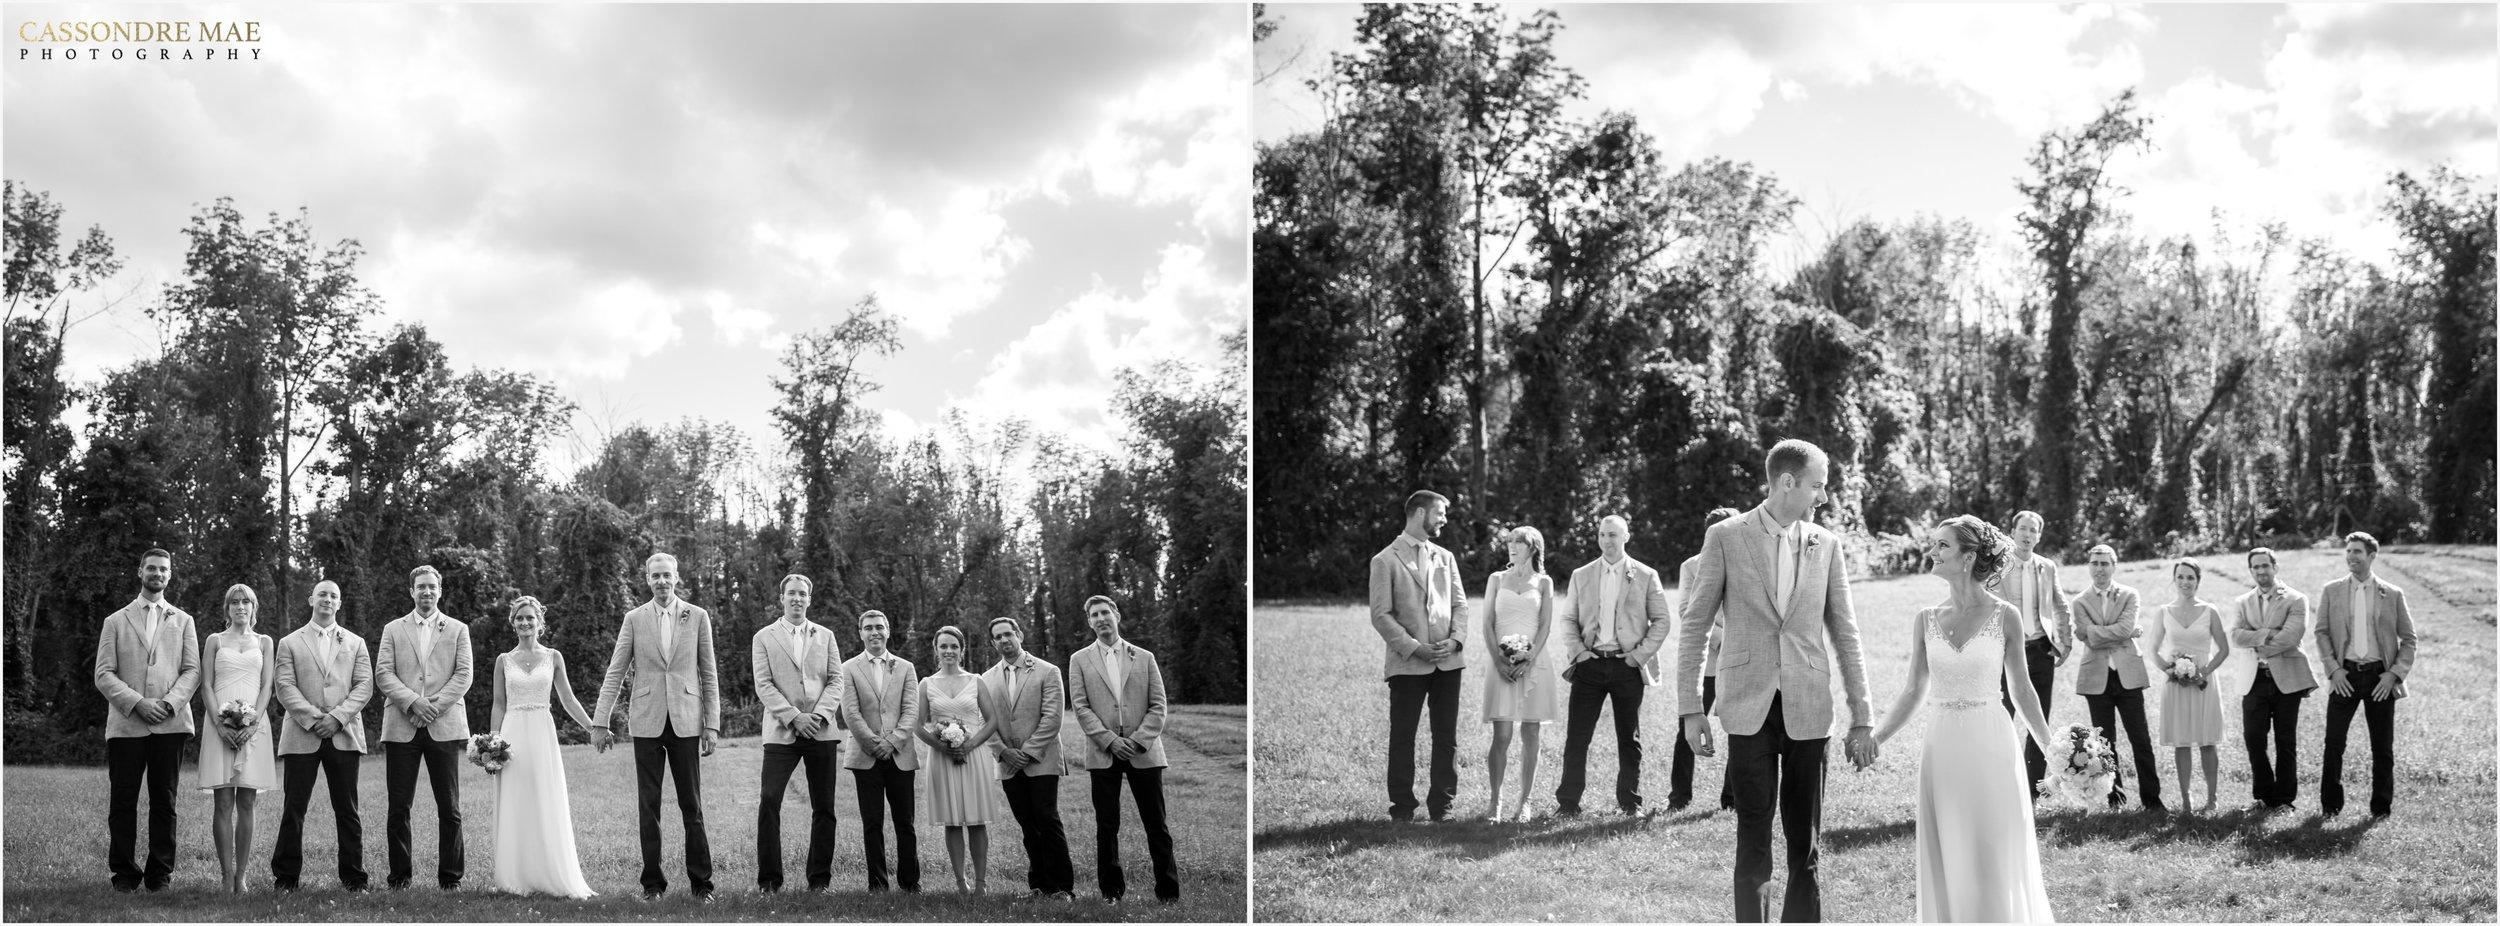 Cassondre Mae Photography Warwick NY Wedding Photographer -15.jpg